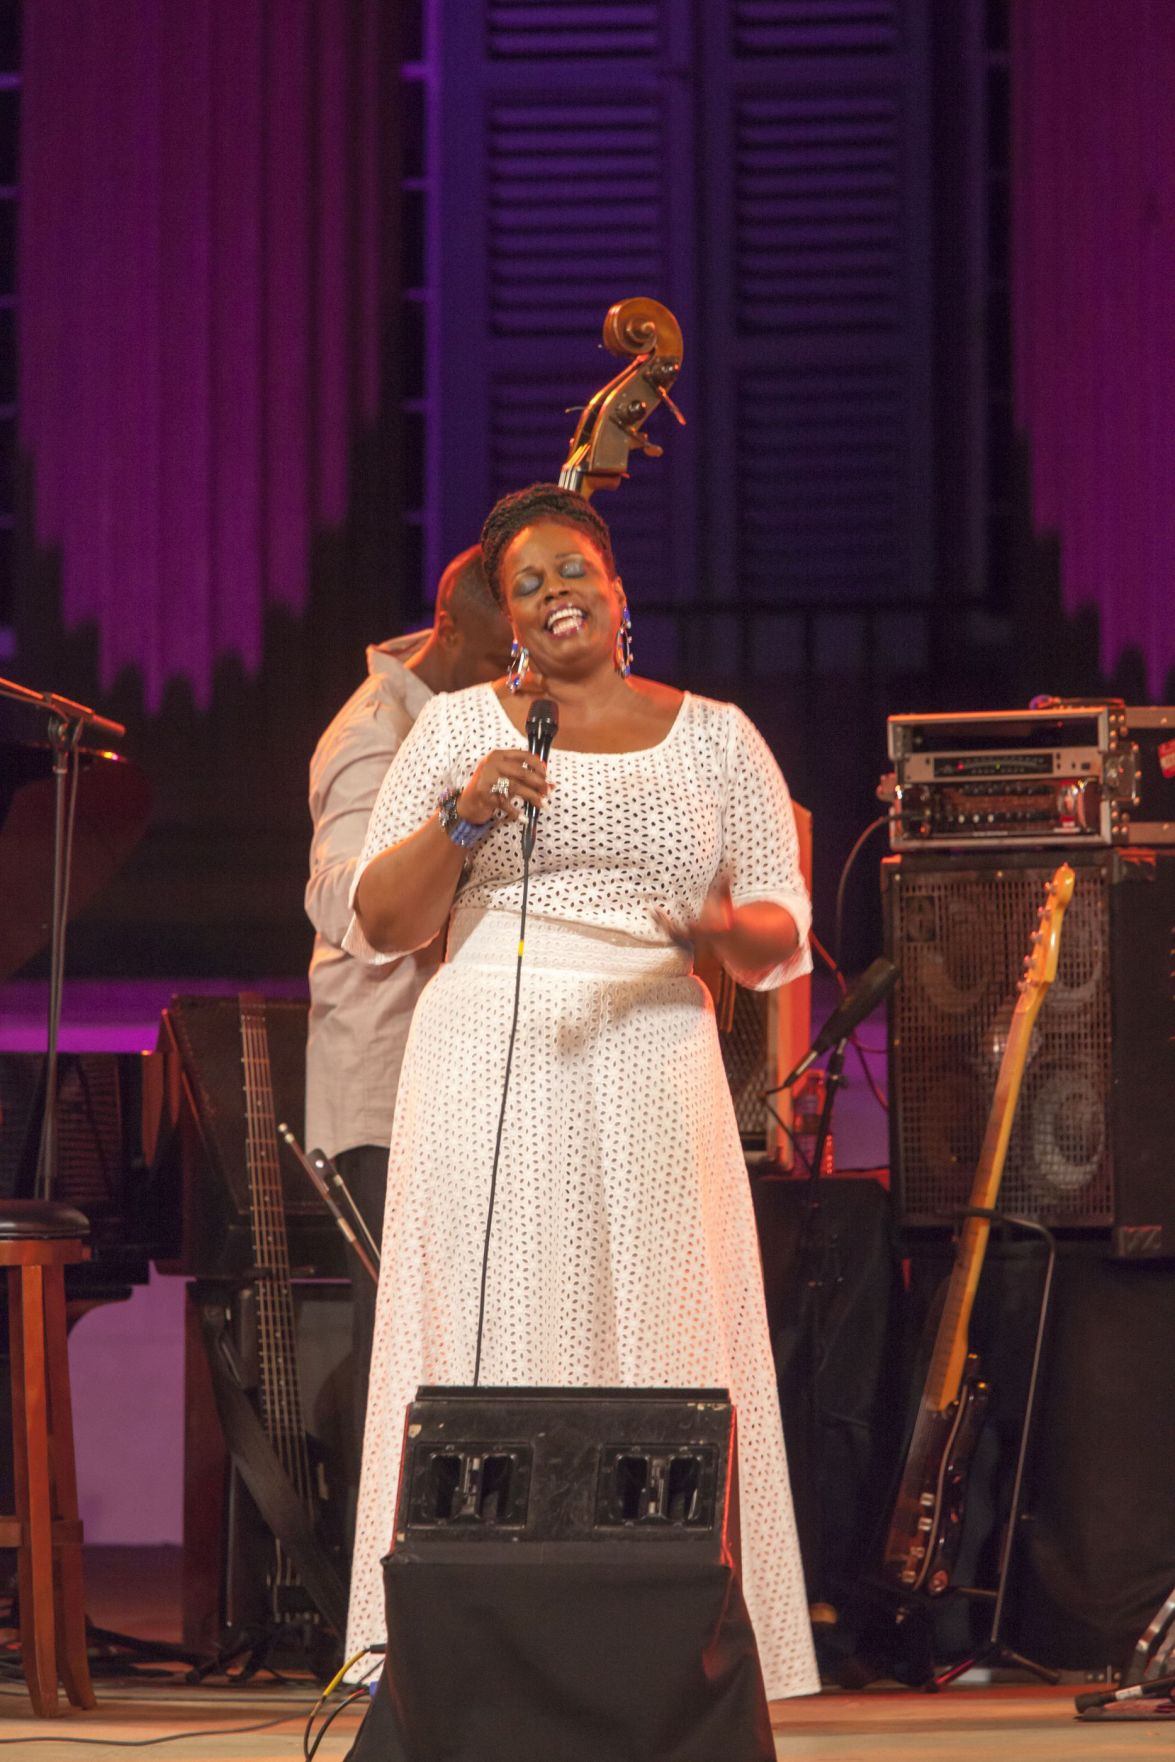 Five-time Grammy Award-winner, delivers blues, soul in jazz series